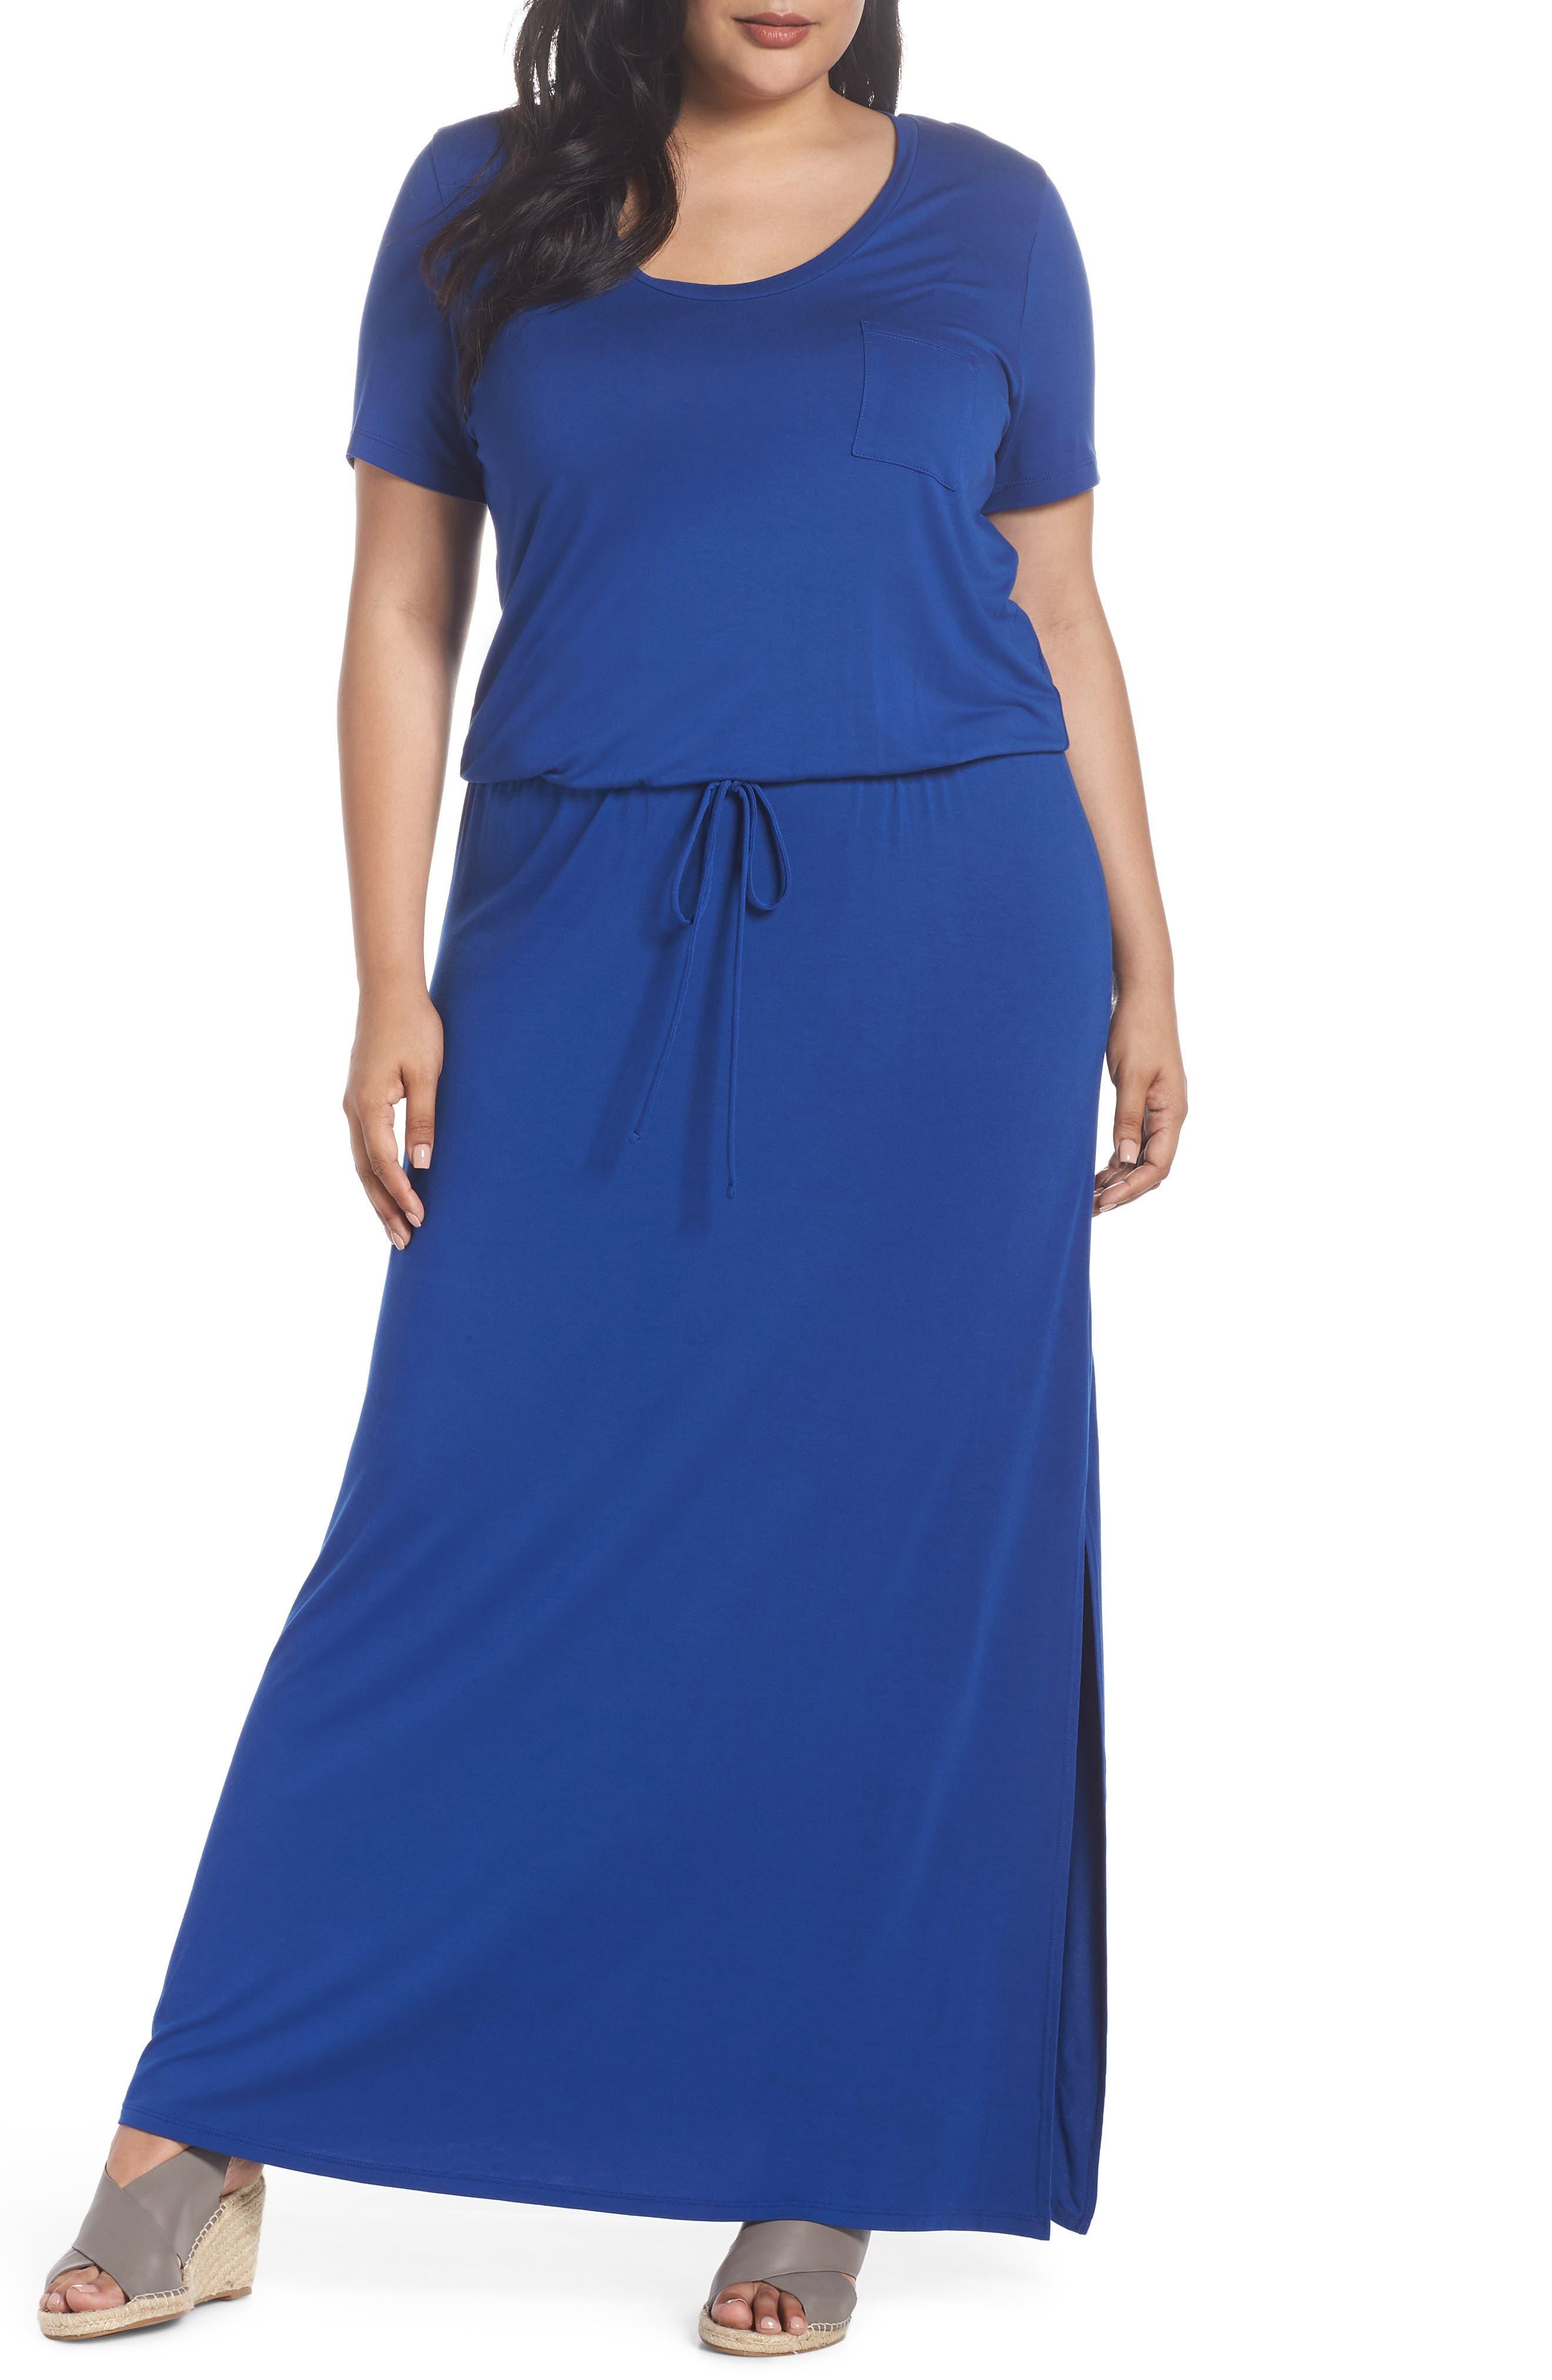 Plus Size Caslon Knit Drawstring Waist Maxi Dress, Blue